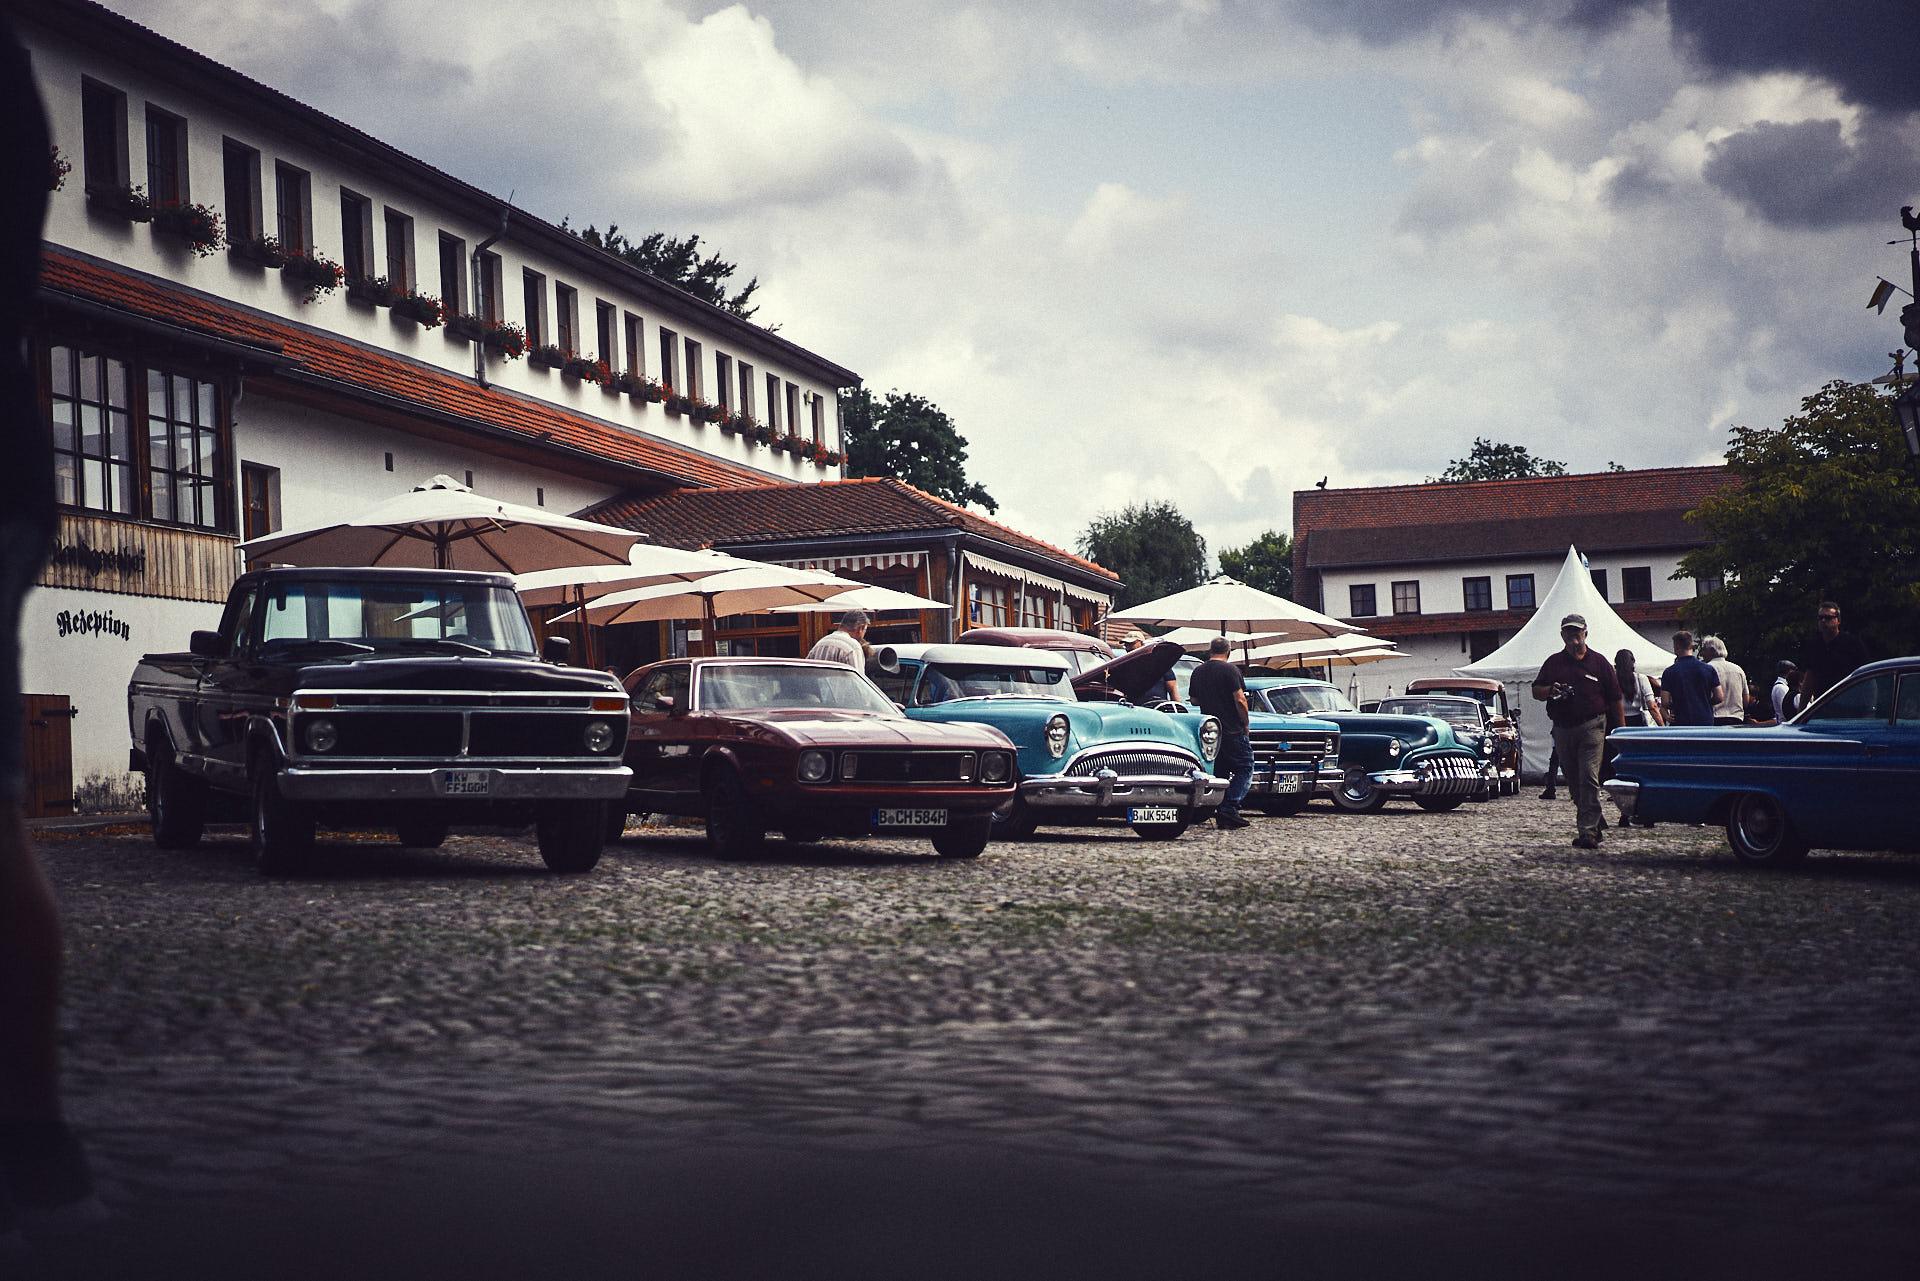 US Car Classics Diedersdorf uscarsgermany kramm us cars classic diedersdorf28